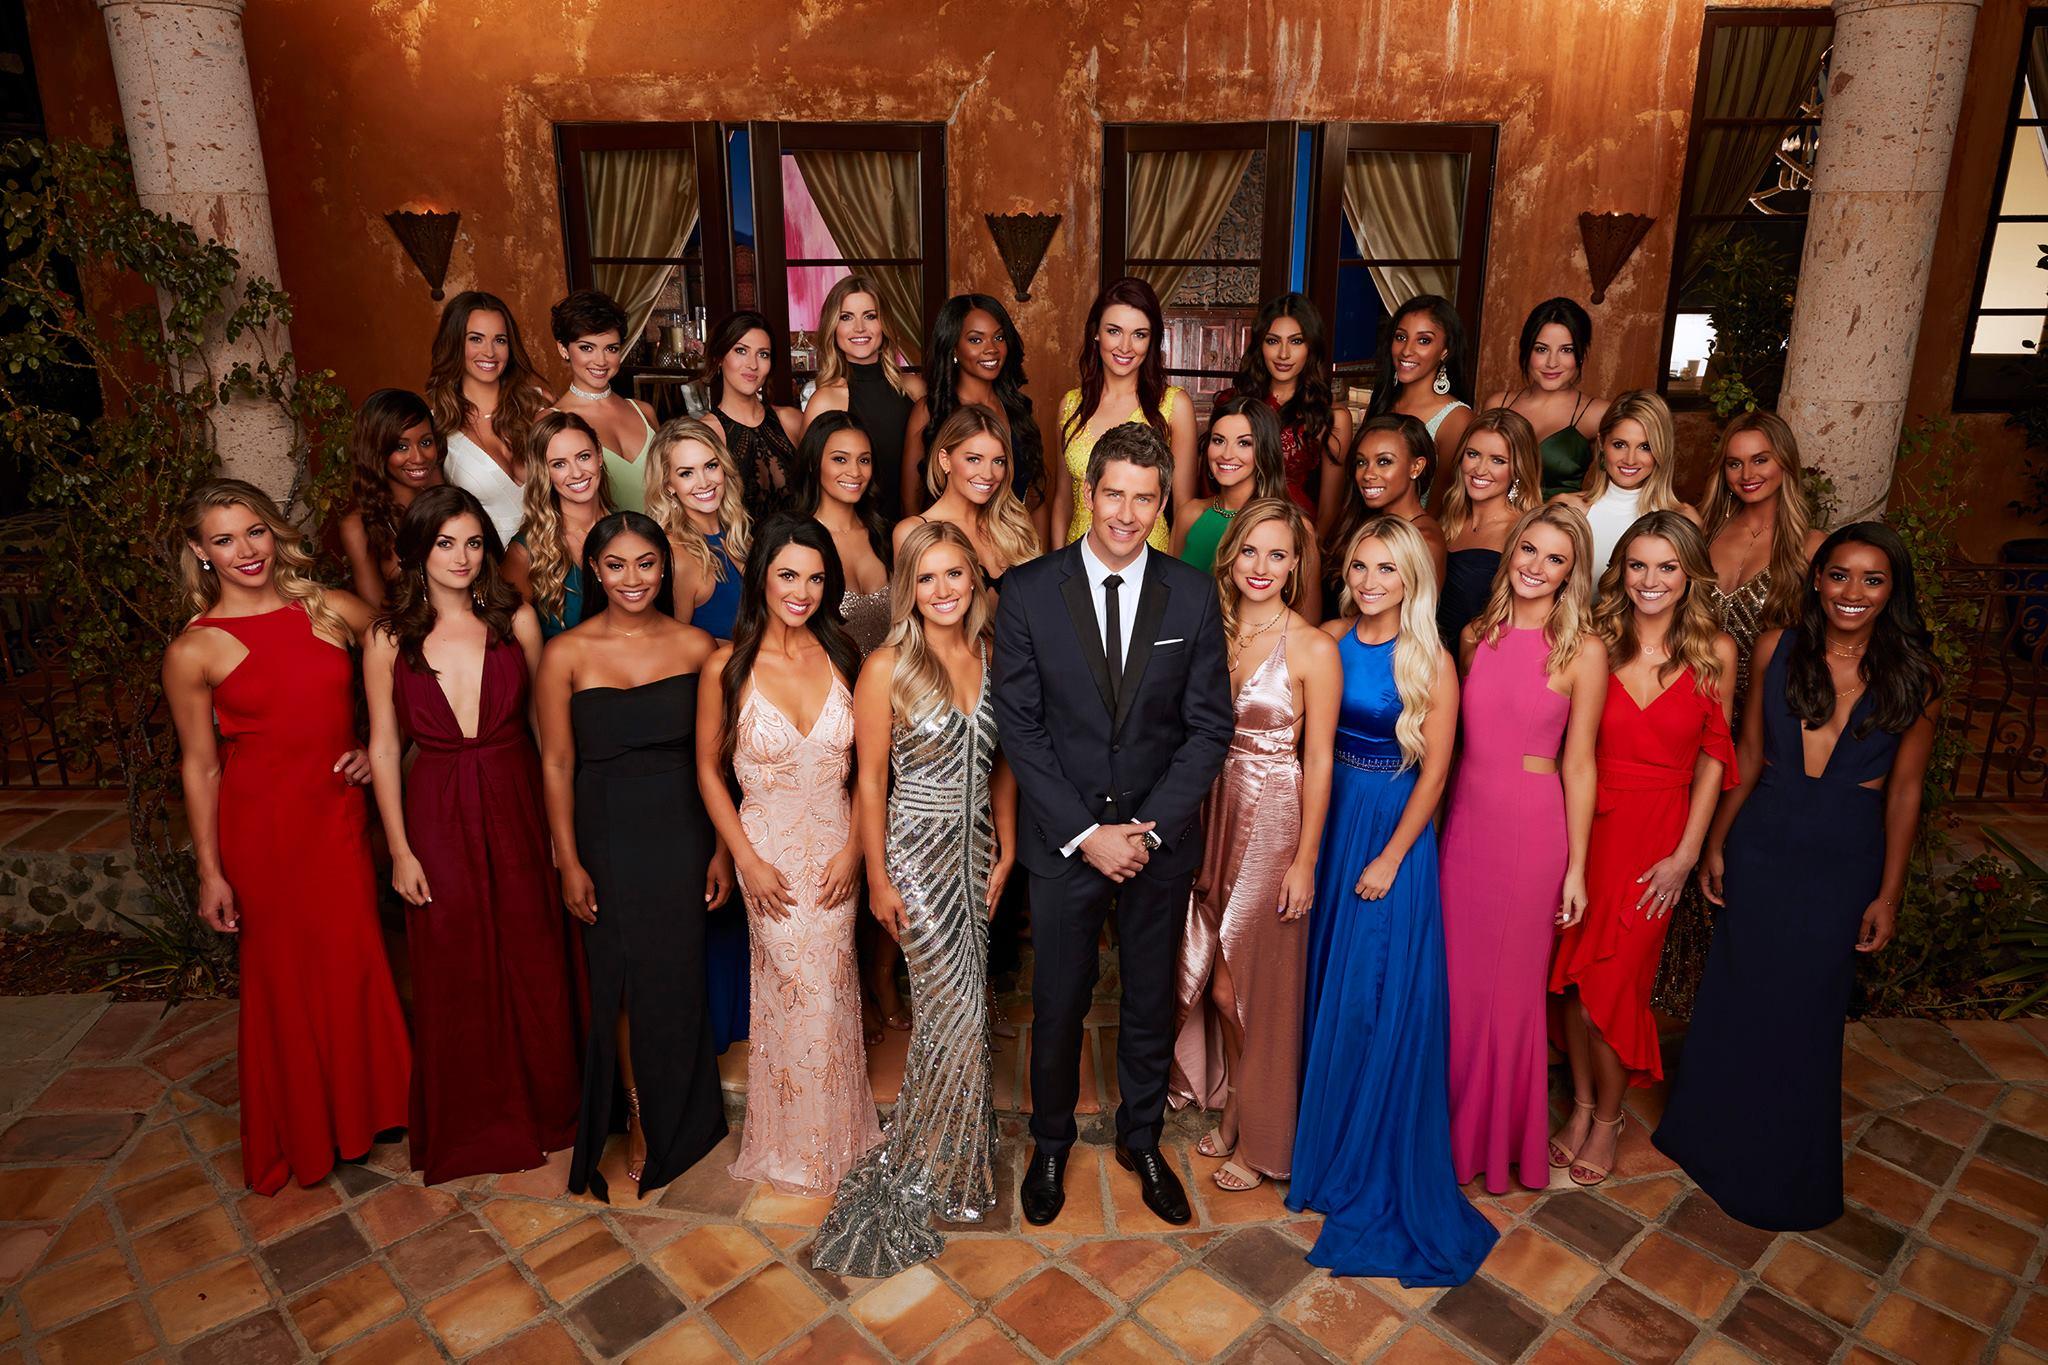 The Bachelor Cast